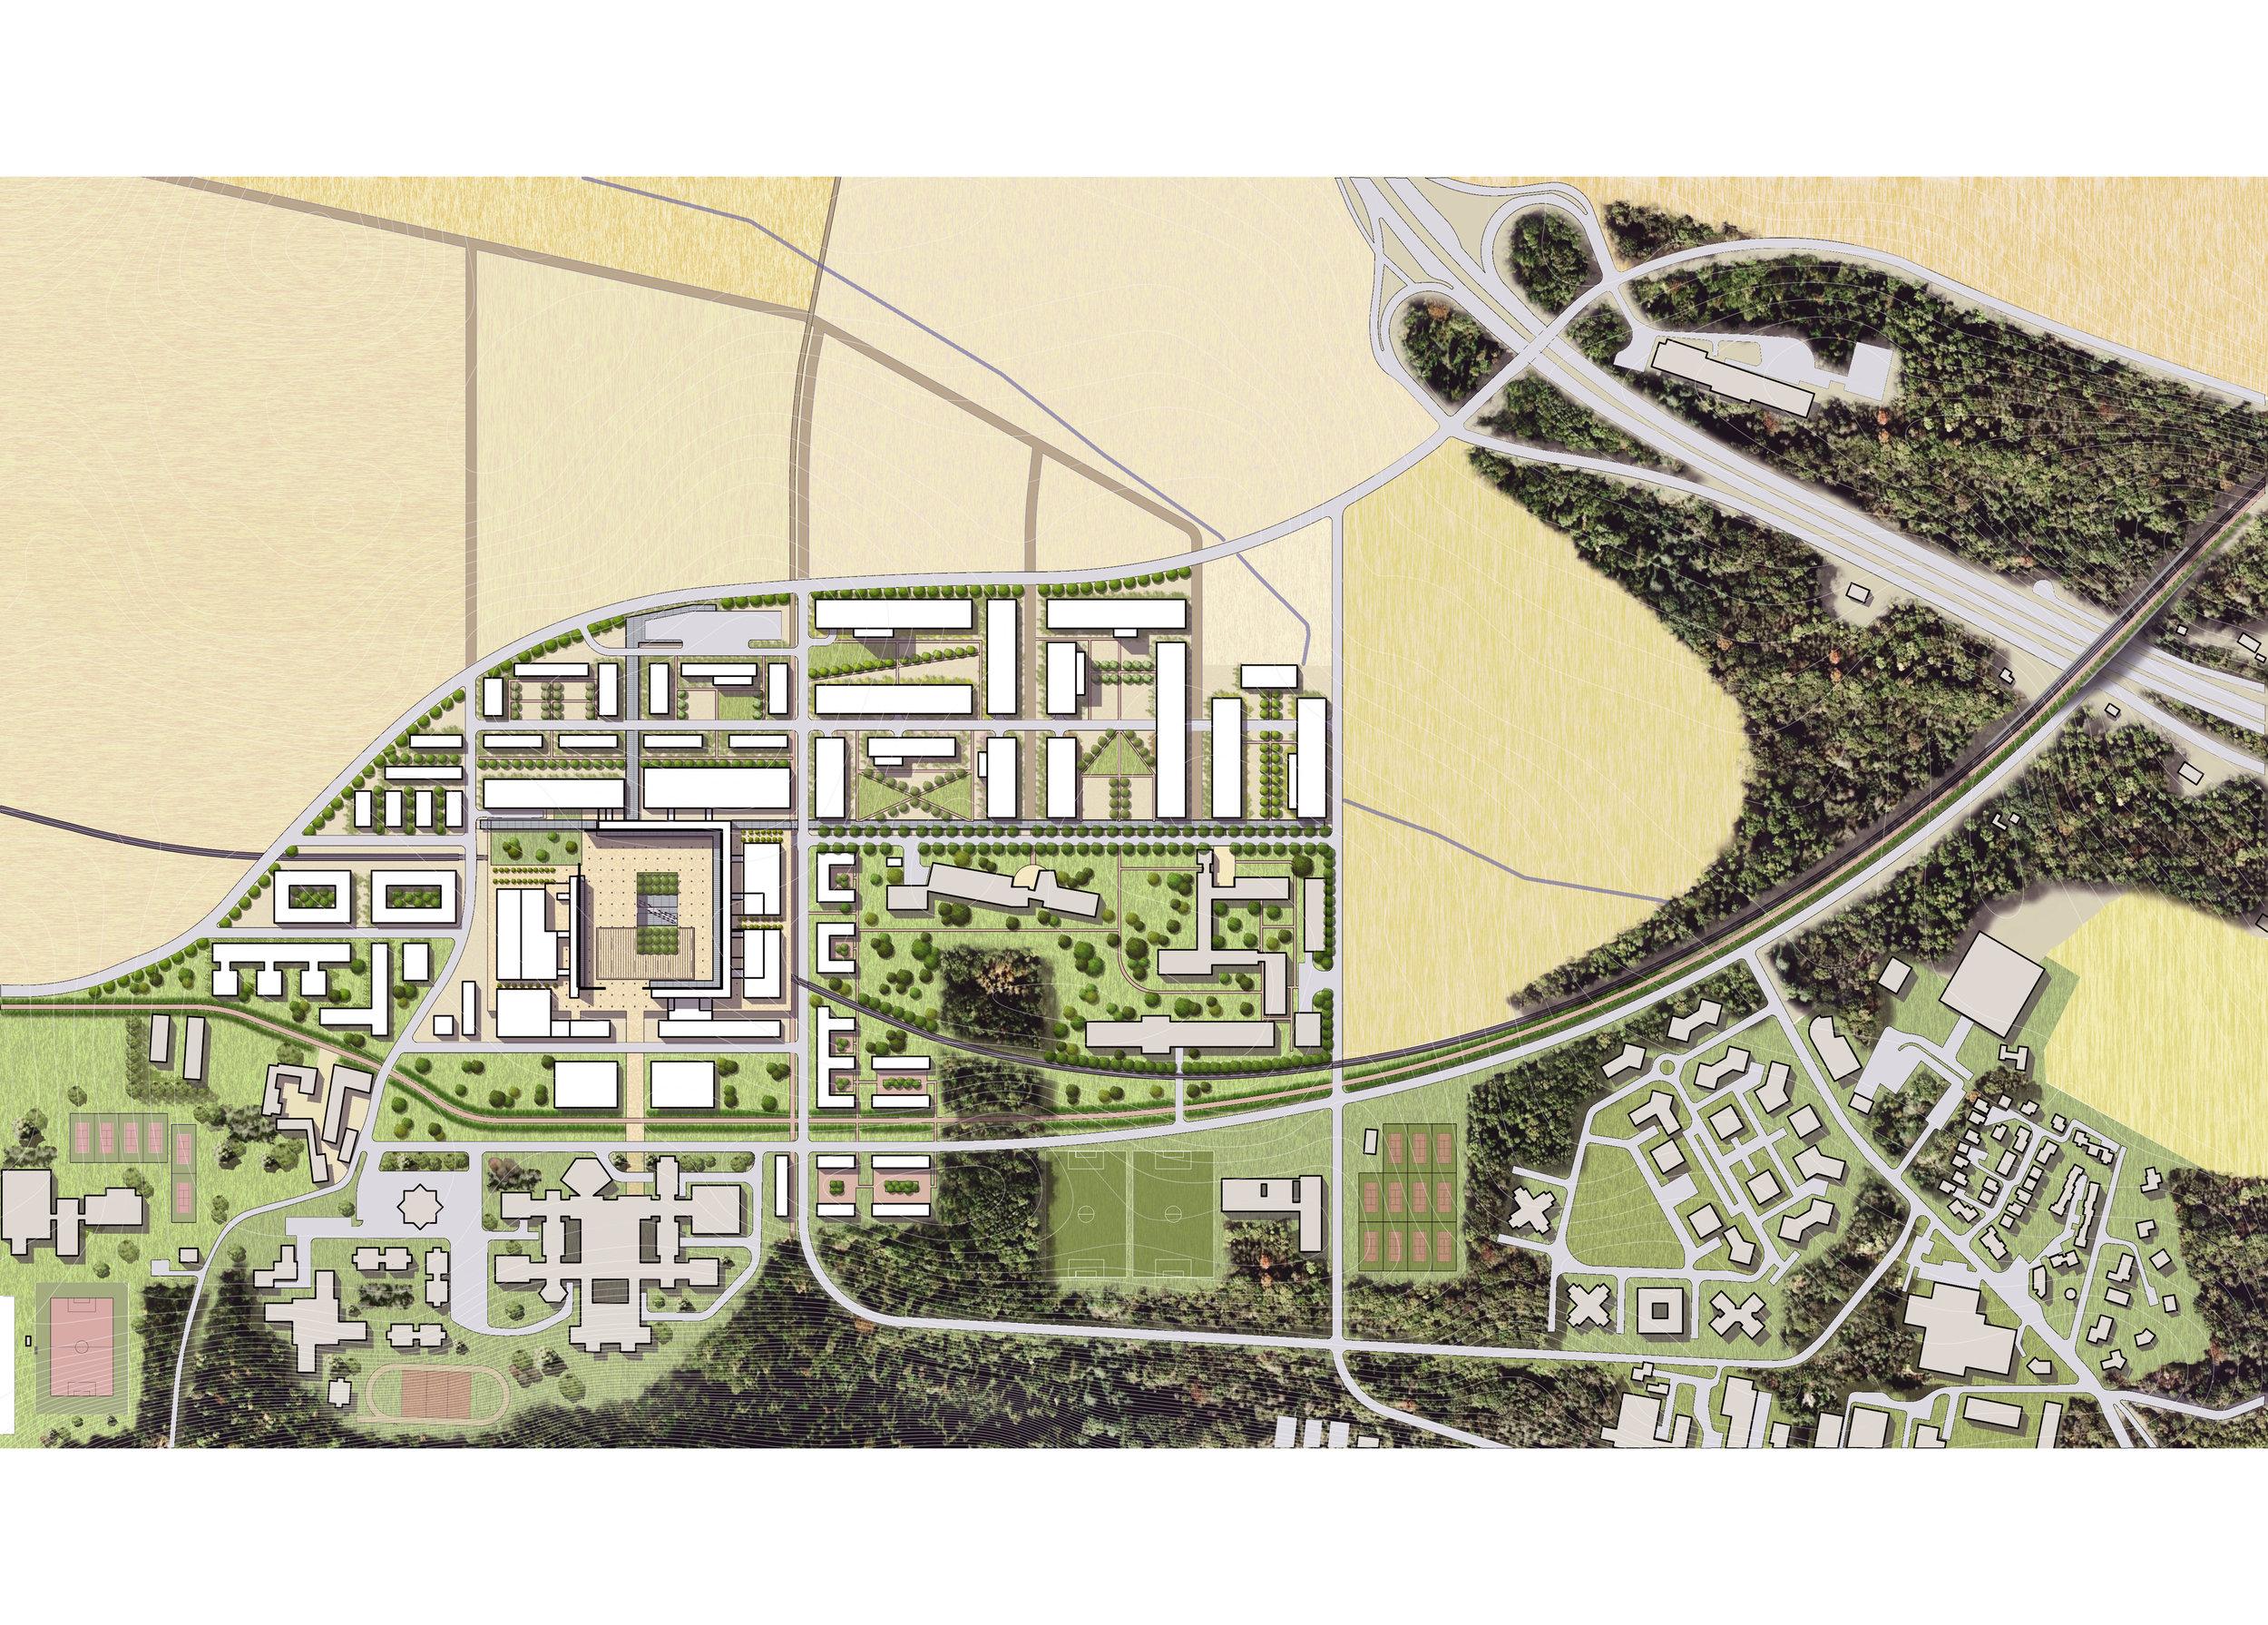 1-2000 Campus Plan w bridge 2.jpg